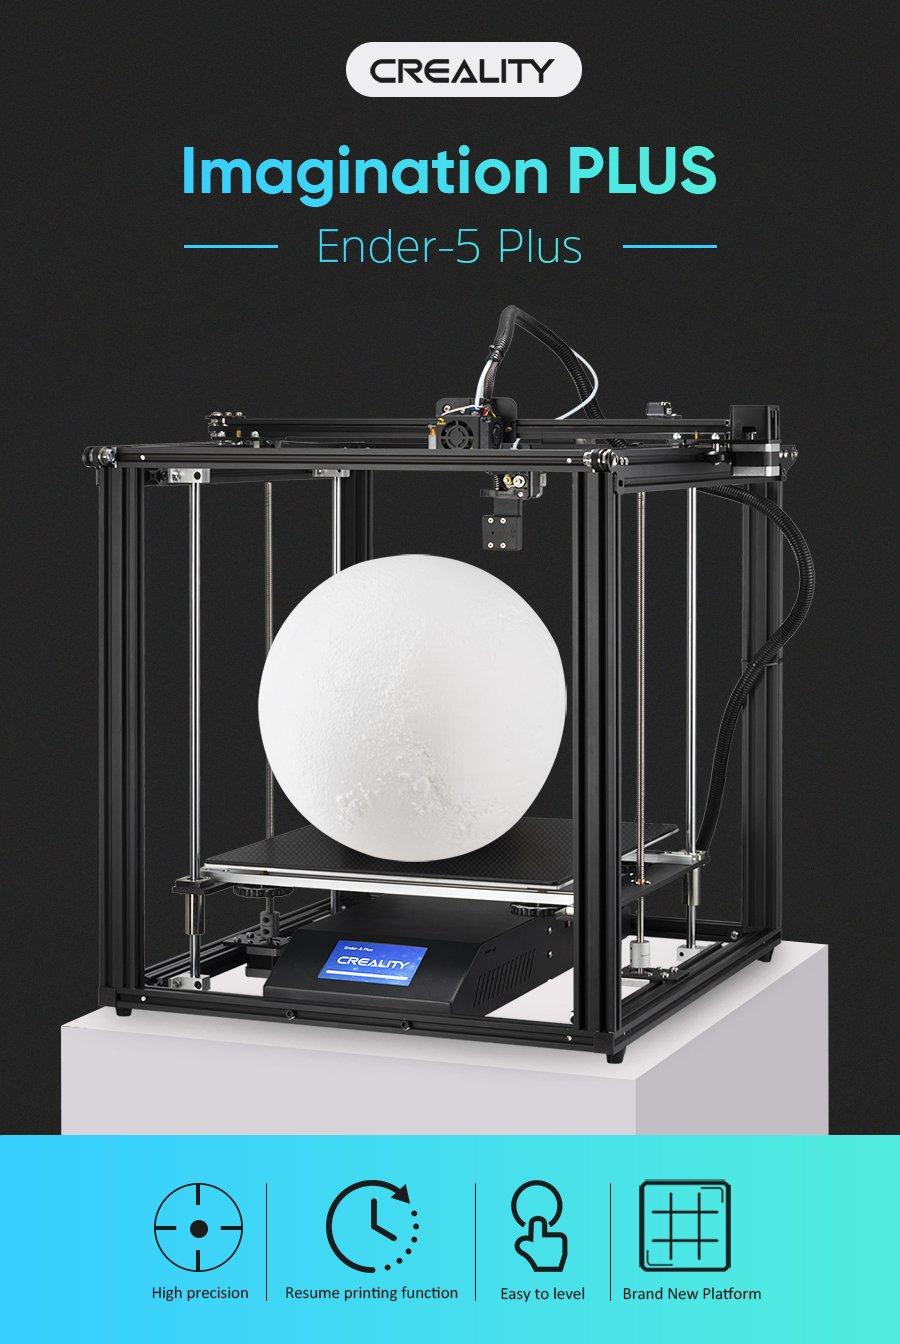 Ender 5 Plus אנדר 5 פלוס מדפסת תלת מימד